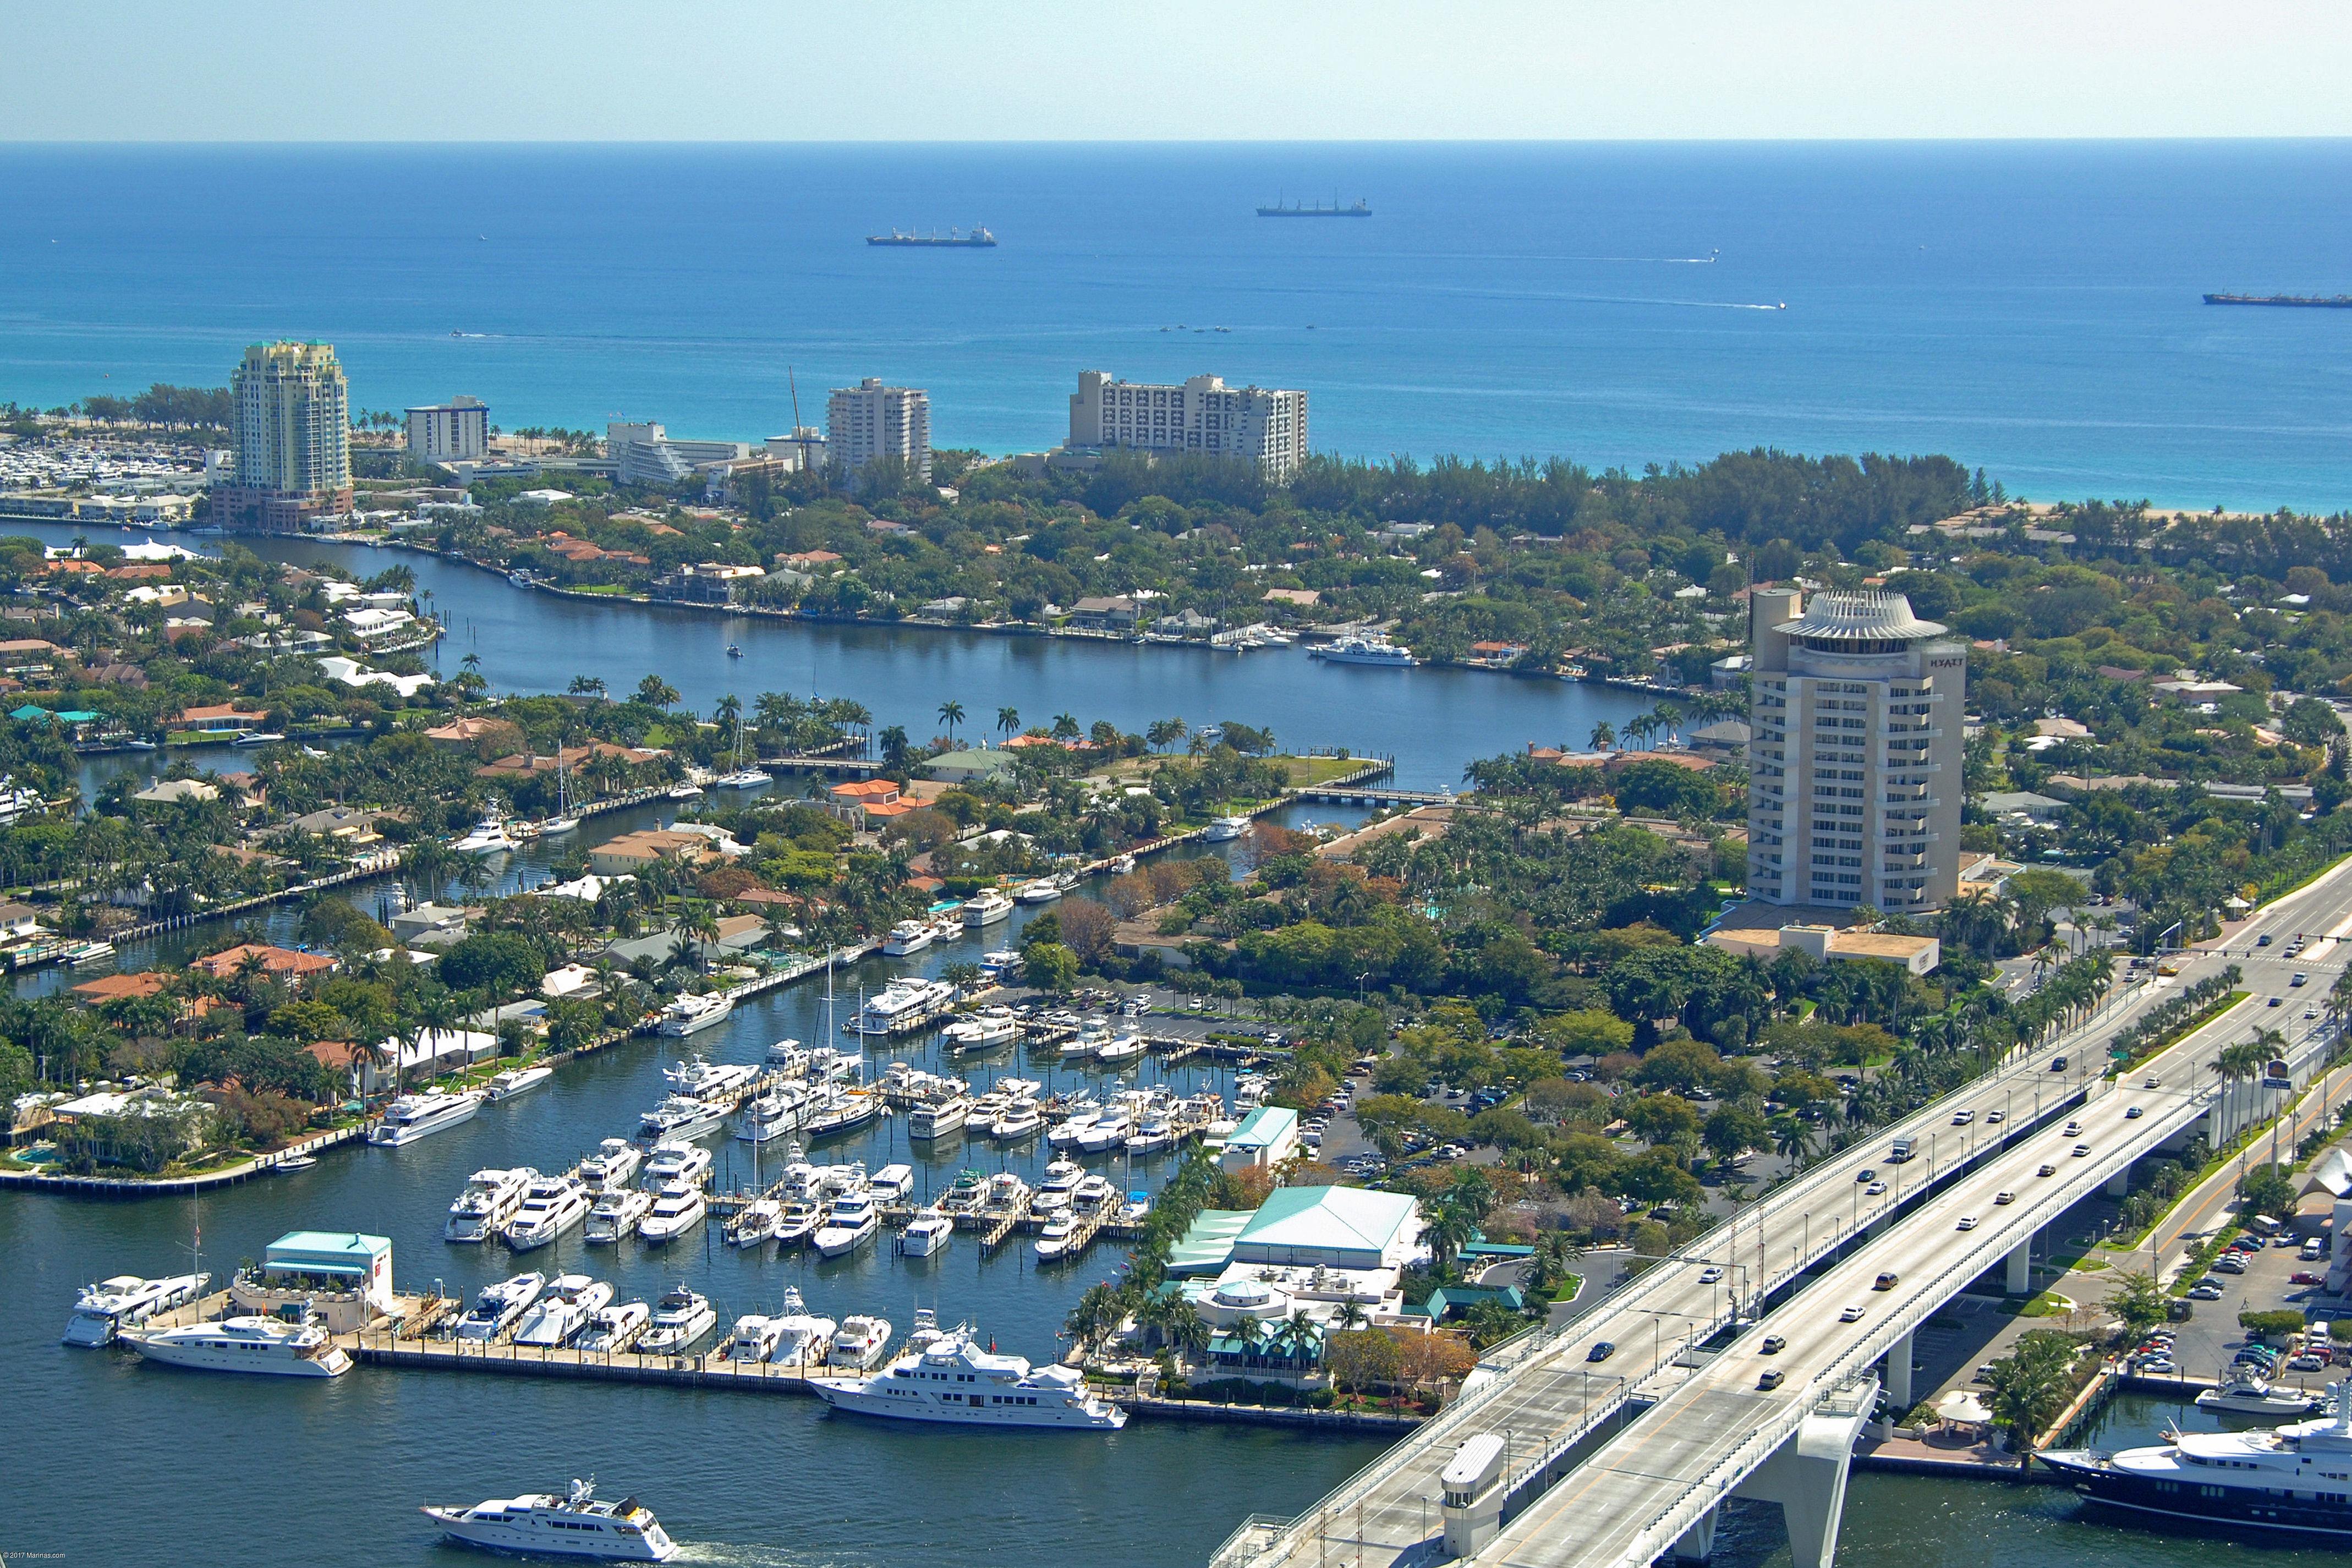 Pier 66 Marina In Fort Lauderdale Fl United States